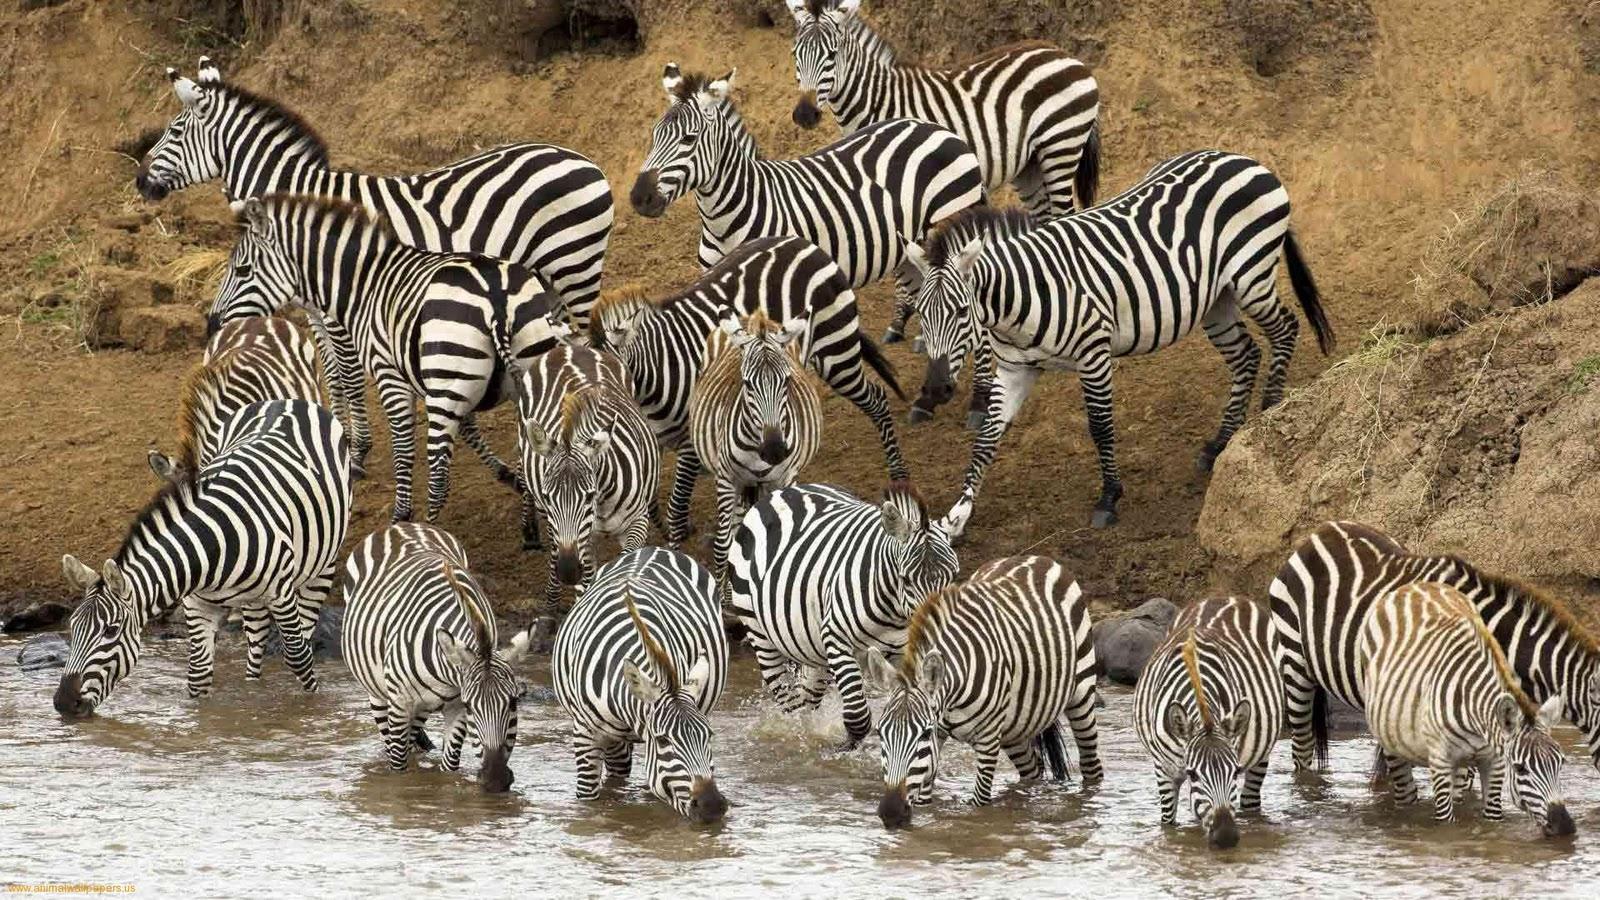 http://1.bp.blogspot.com/-THon4HsEdm4/ULoLxu_5csI/AAAAAAAAJEI/B3ixlQt5Q6g/s1600/Wild-Animal-zebra-Wallpaper-1080p-HDTV.jpeg